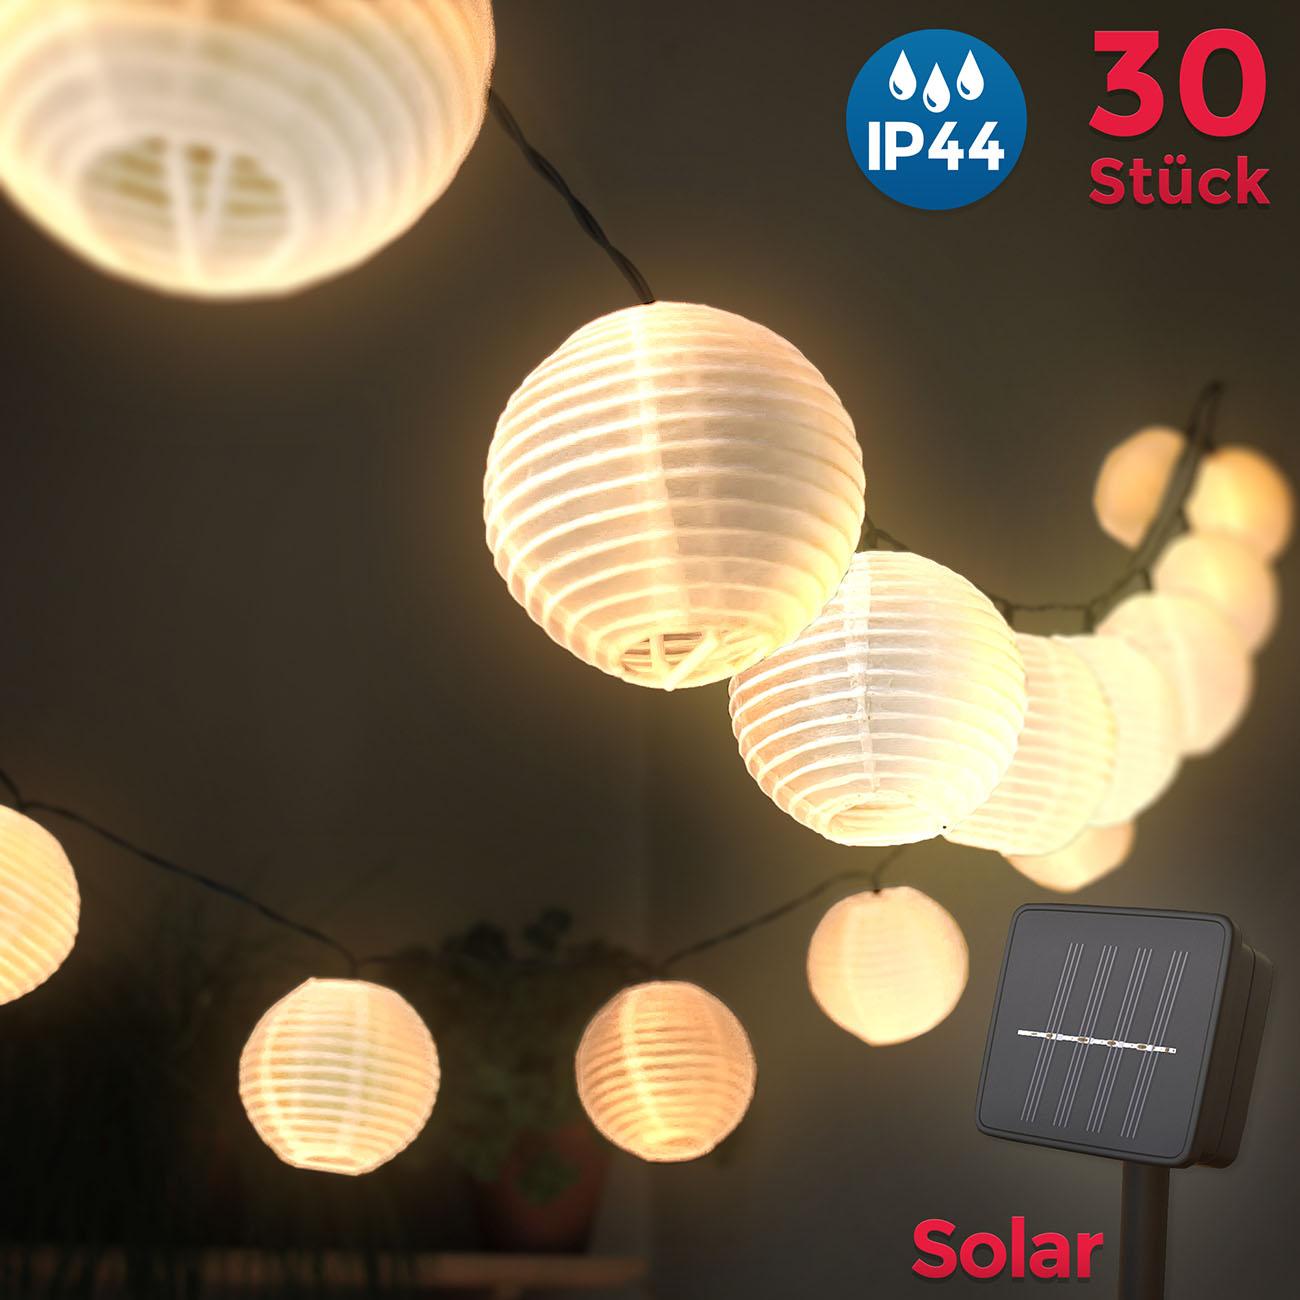 LED Außenlicherkette Solar Lampions 6m - 2